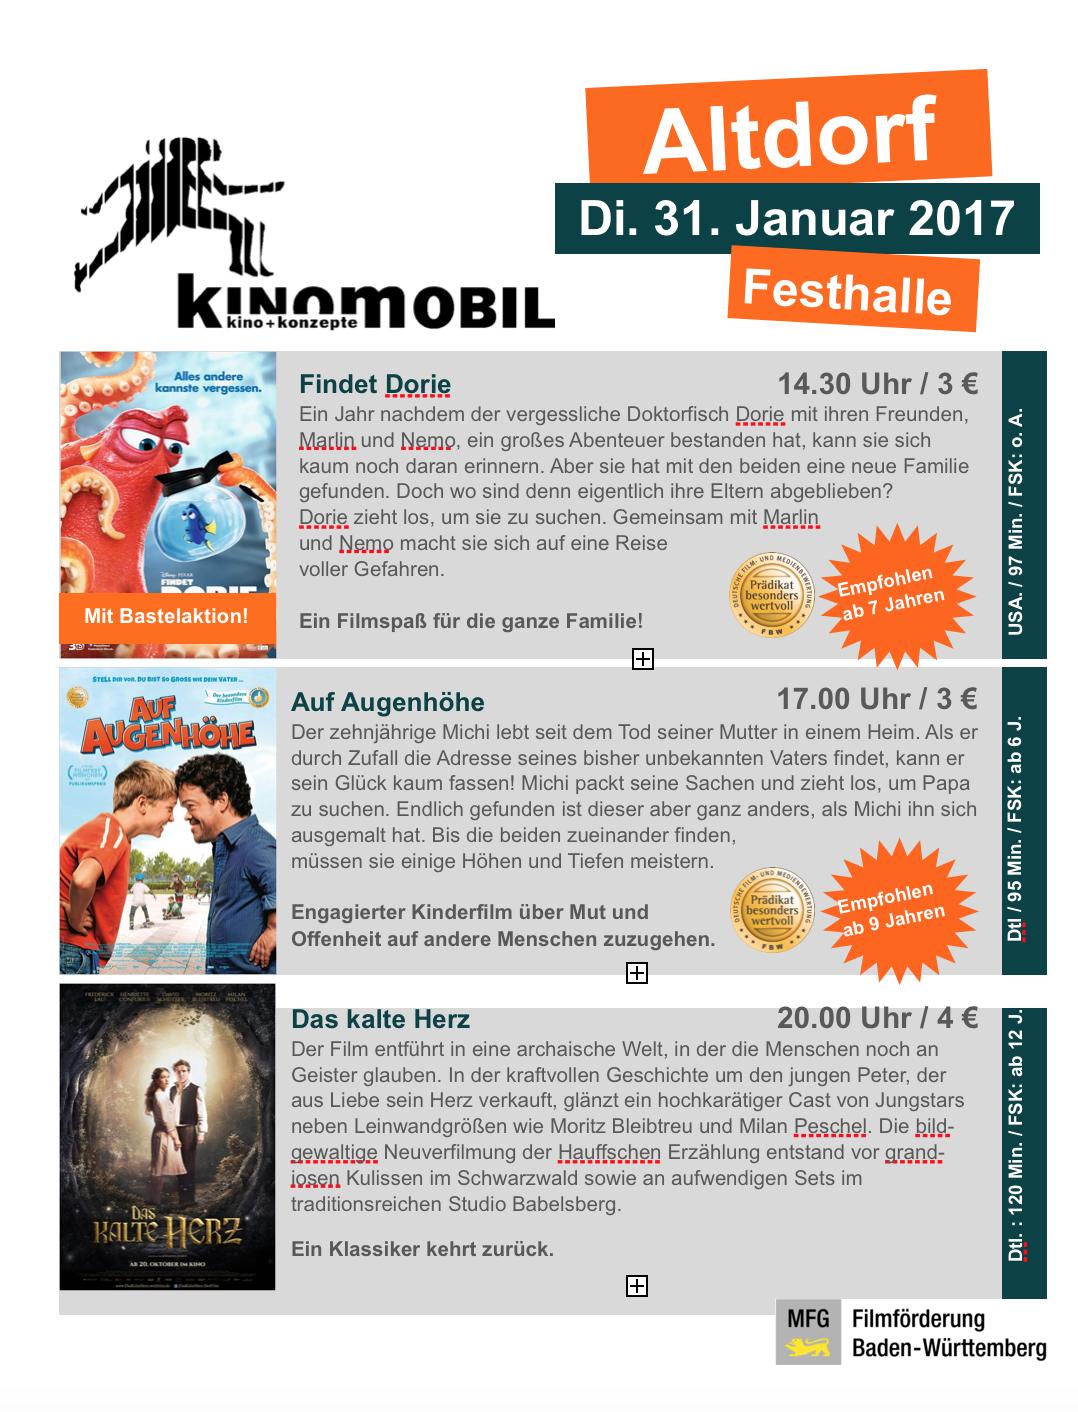 Kinomobil zu Gast in Altdorf